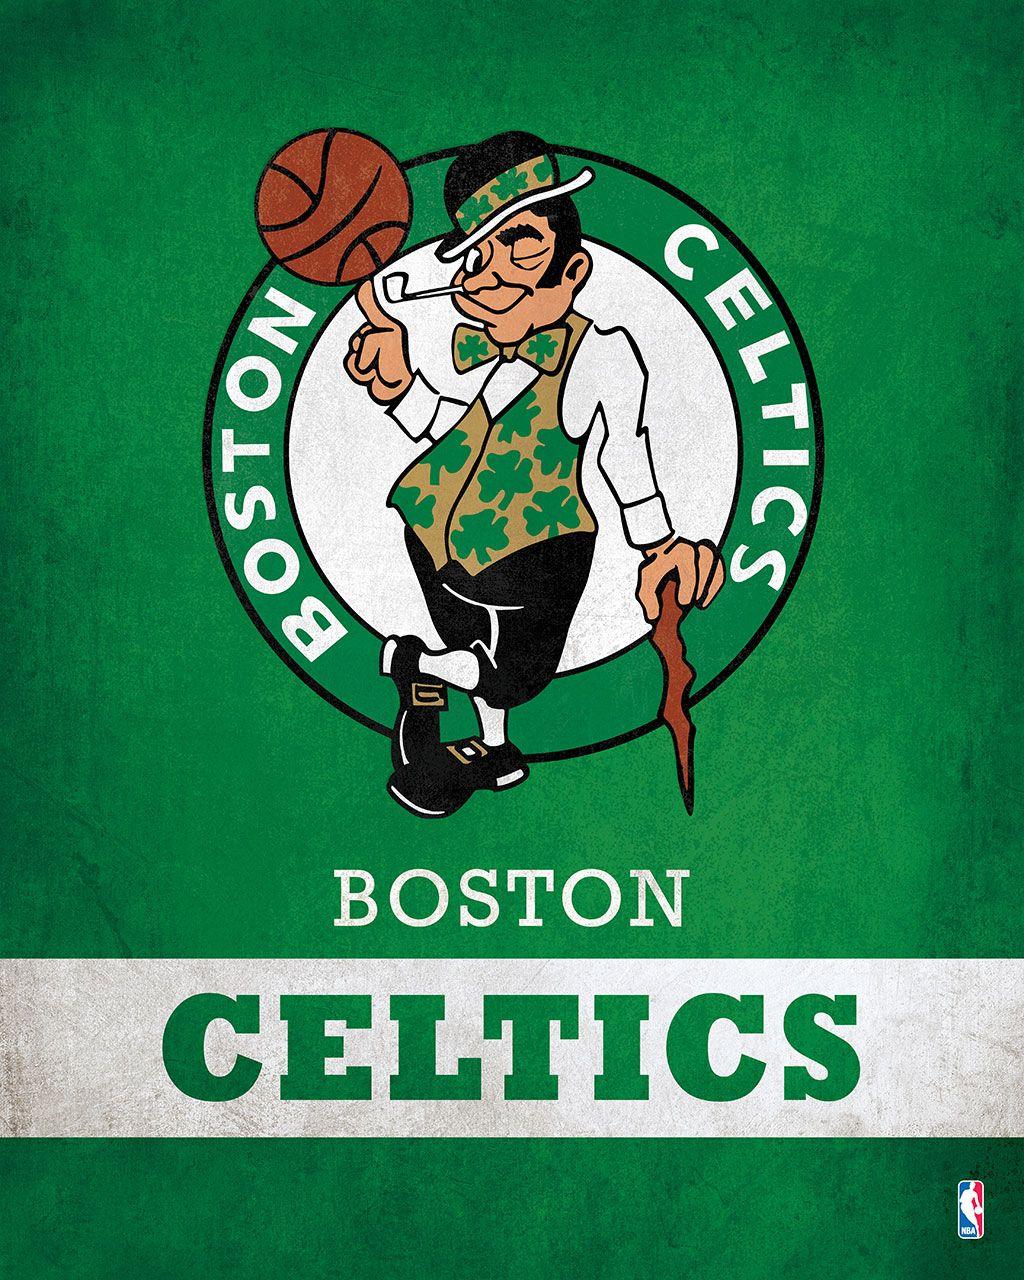 Boston Celtics Logo 24.99 Boston celtics logo, Boston